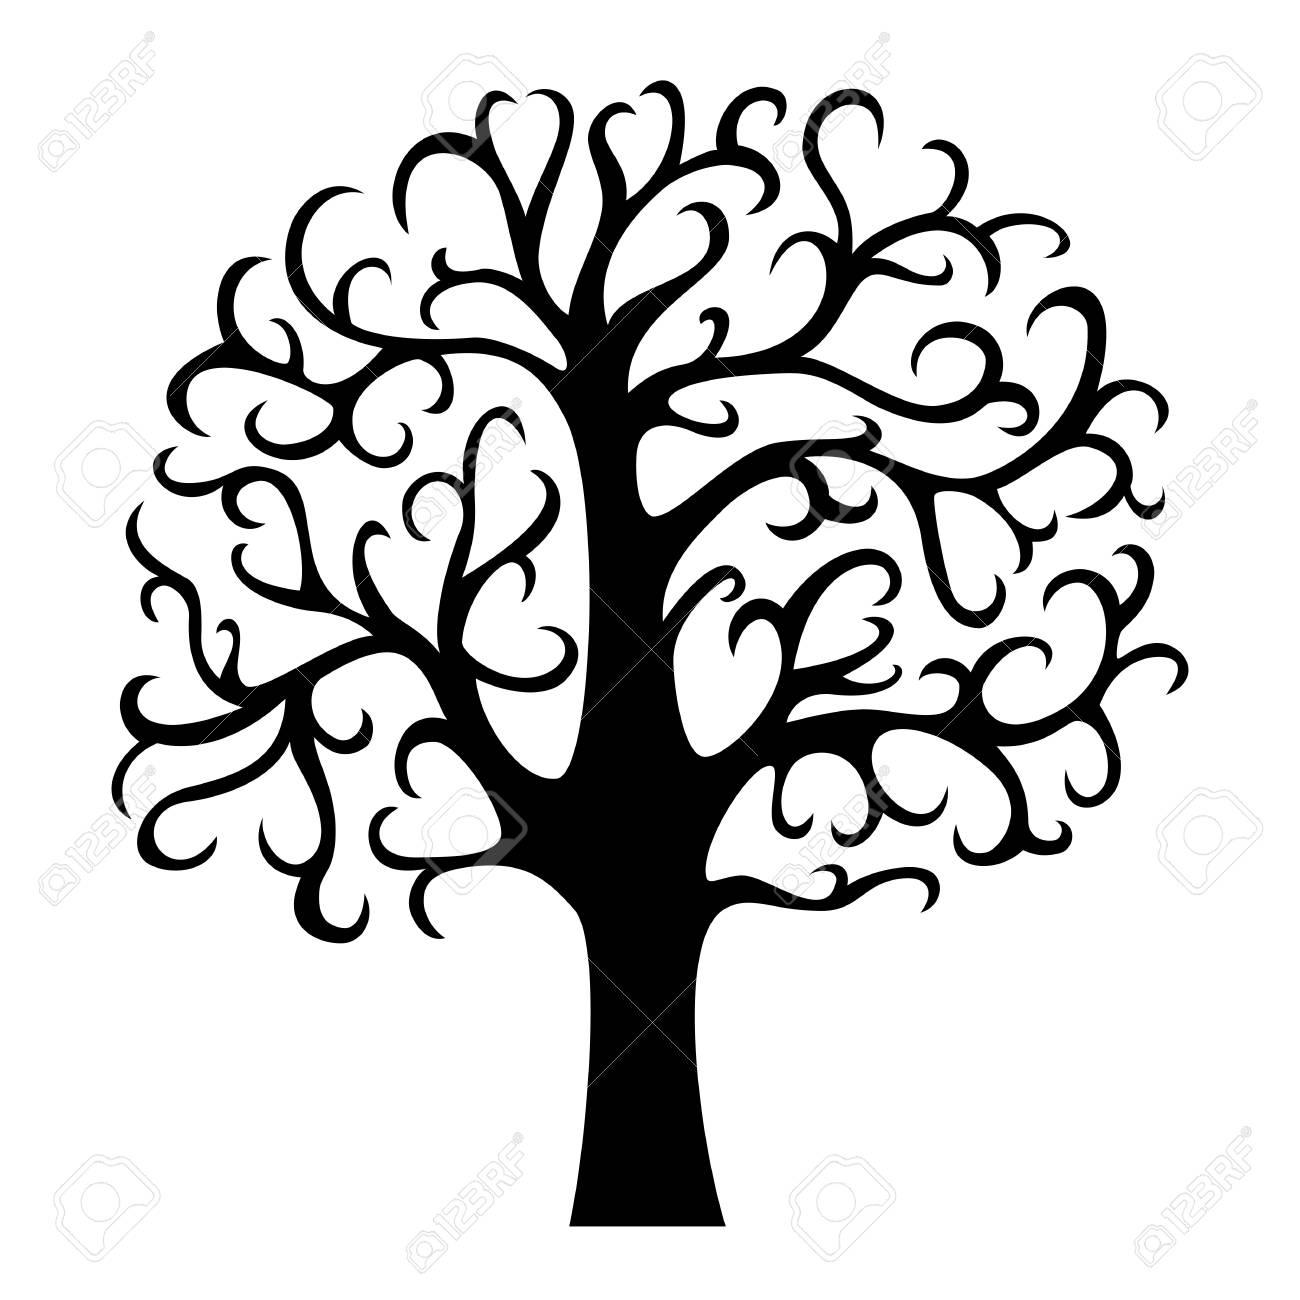 images?q=tbn:ANd9GcQh_l3eQ5xwiPy07kGEXjmjgmBKBRB7H2mRxCGhv1tFWg5c_mWT Awesome Family Tree Vector Art @koolgadgetz.com.info